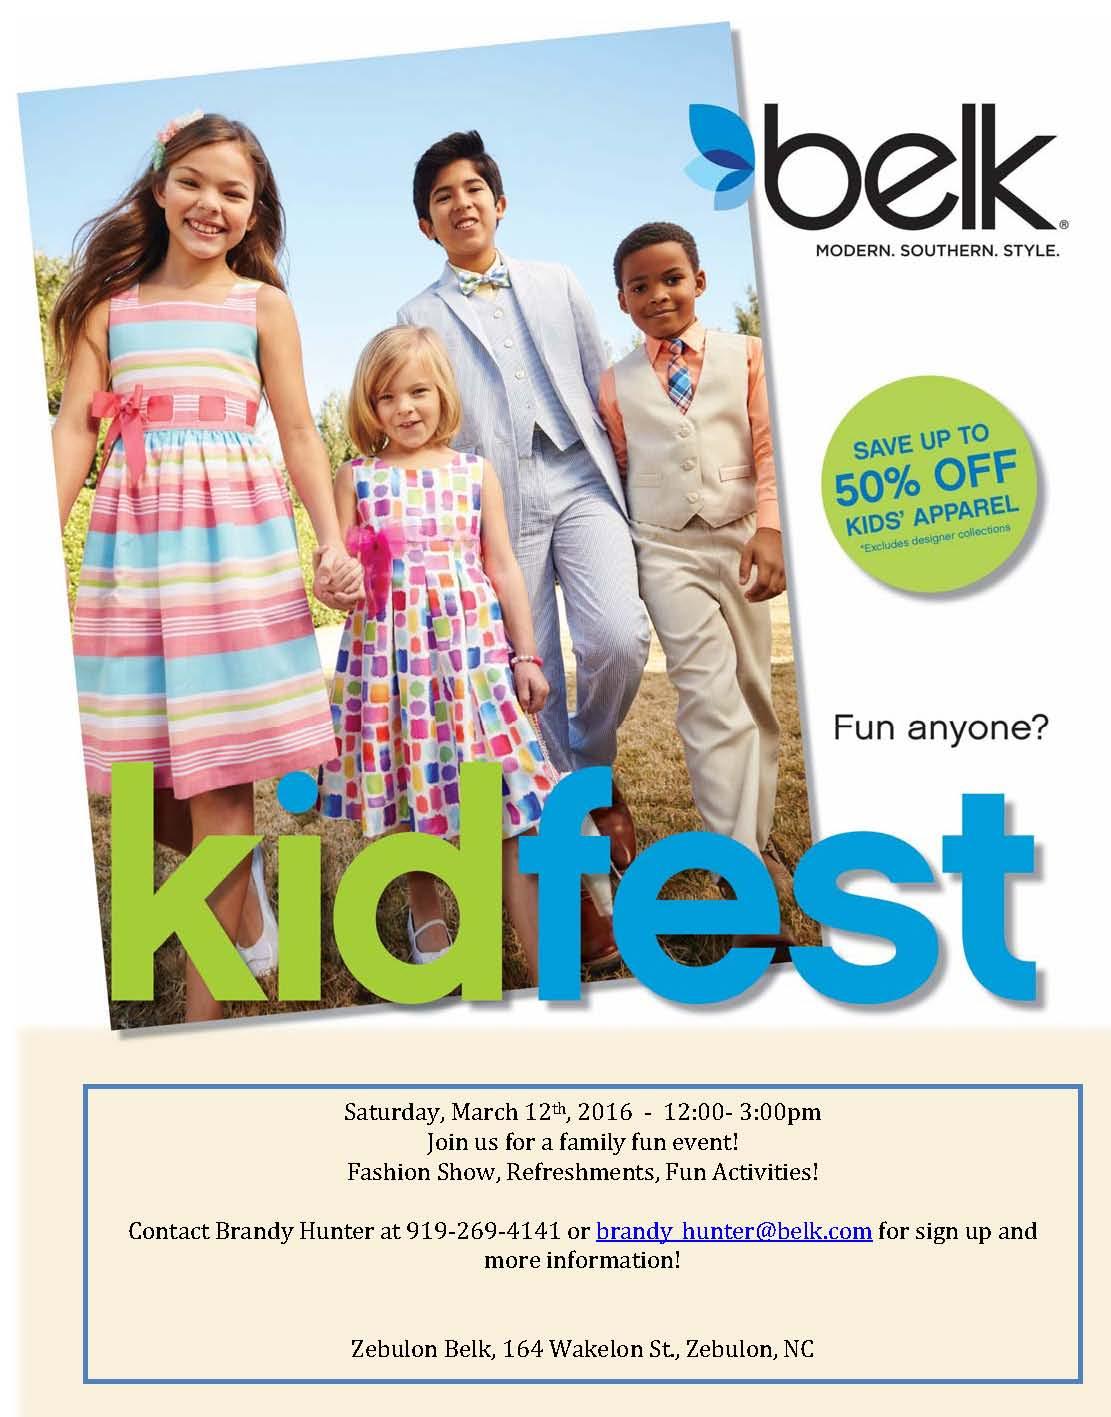 Zebulon Belk Seeking Models For Kidfest The Grey Area News